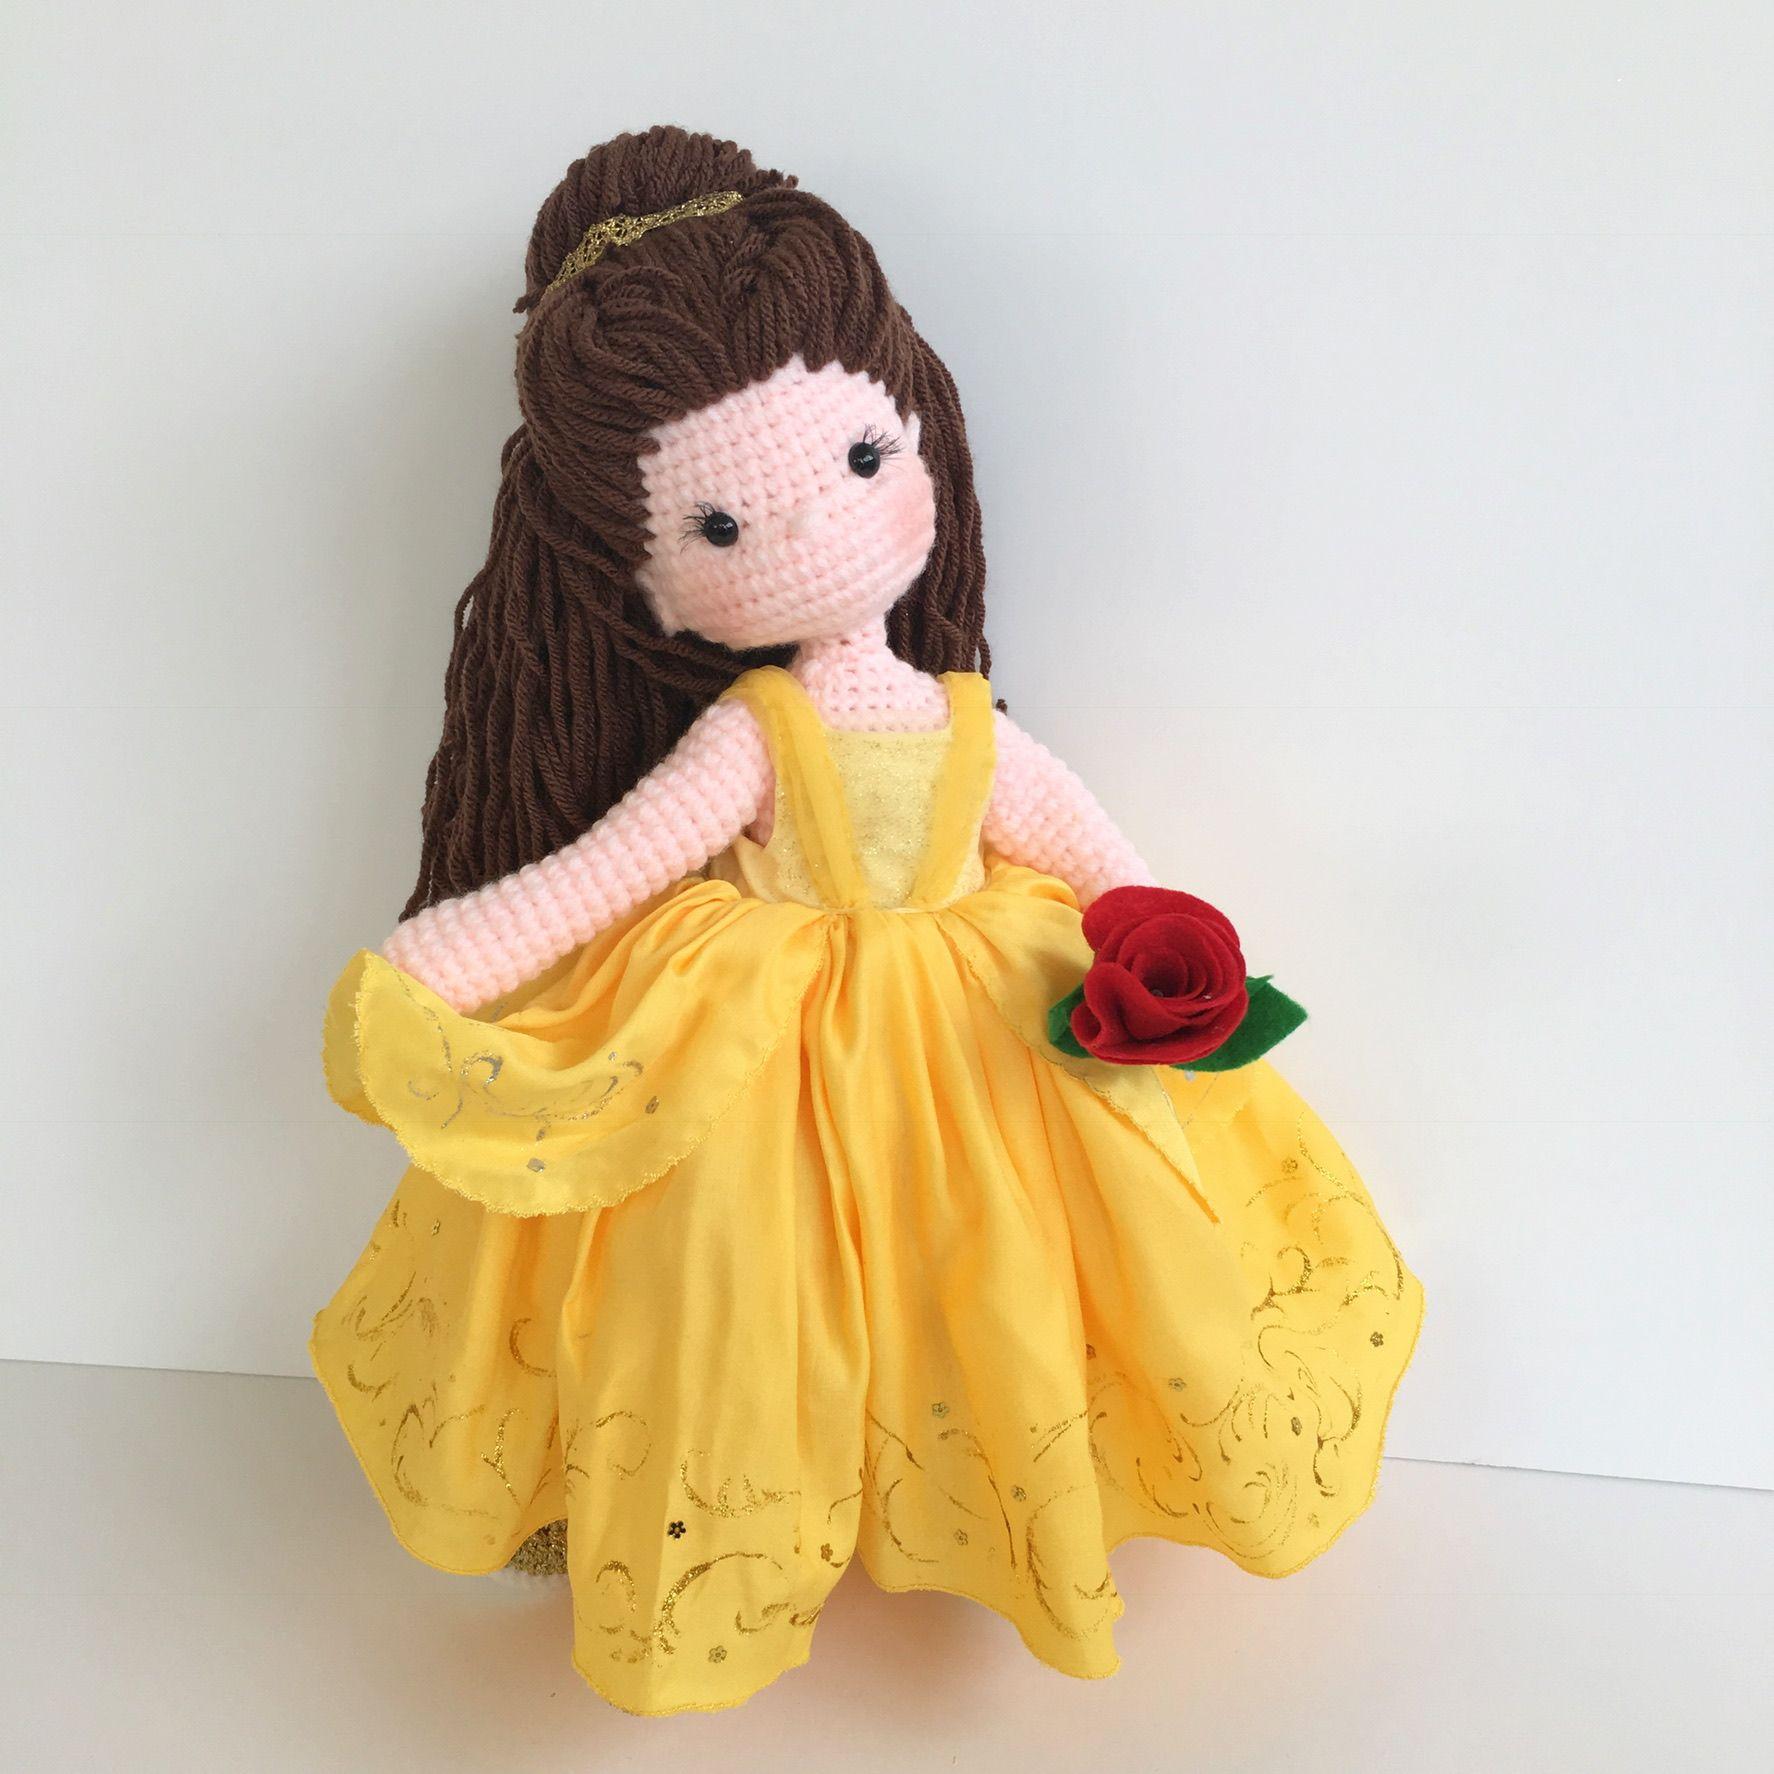 Amigurumi Beauty doll Nathaliesweetstitches.com ...